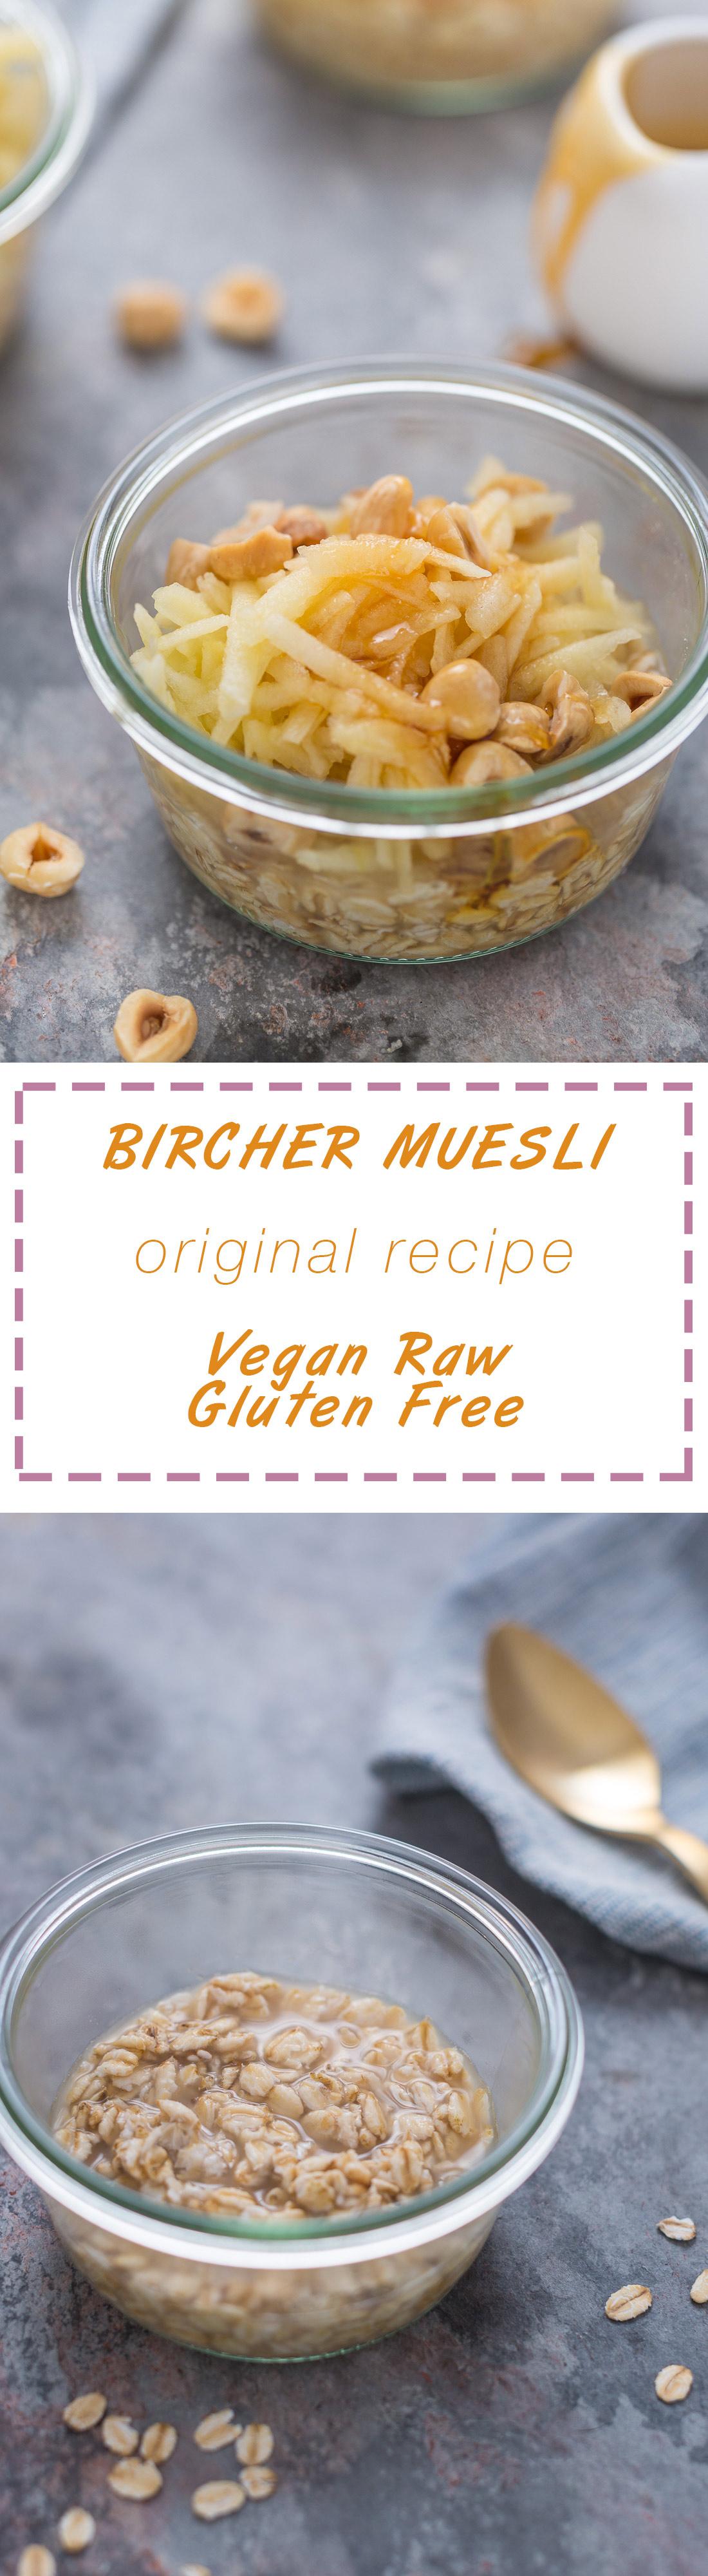 ricetta originale bircher muesli - avena con mele e nocciole o mandorle Original vegan Bircher muesli recipe